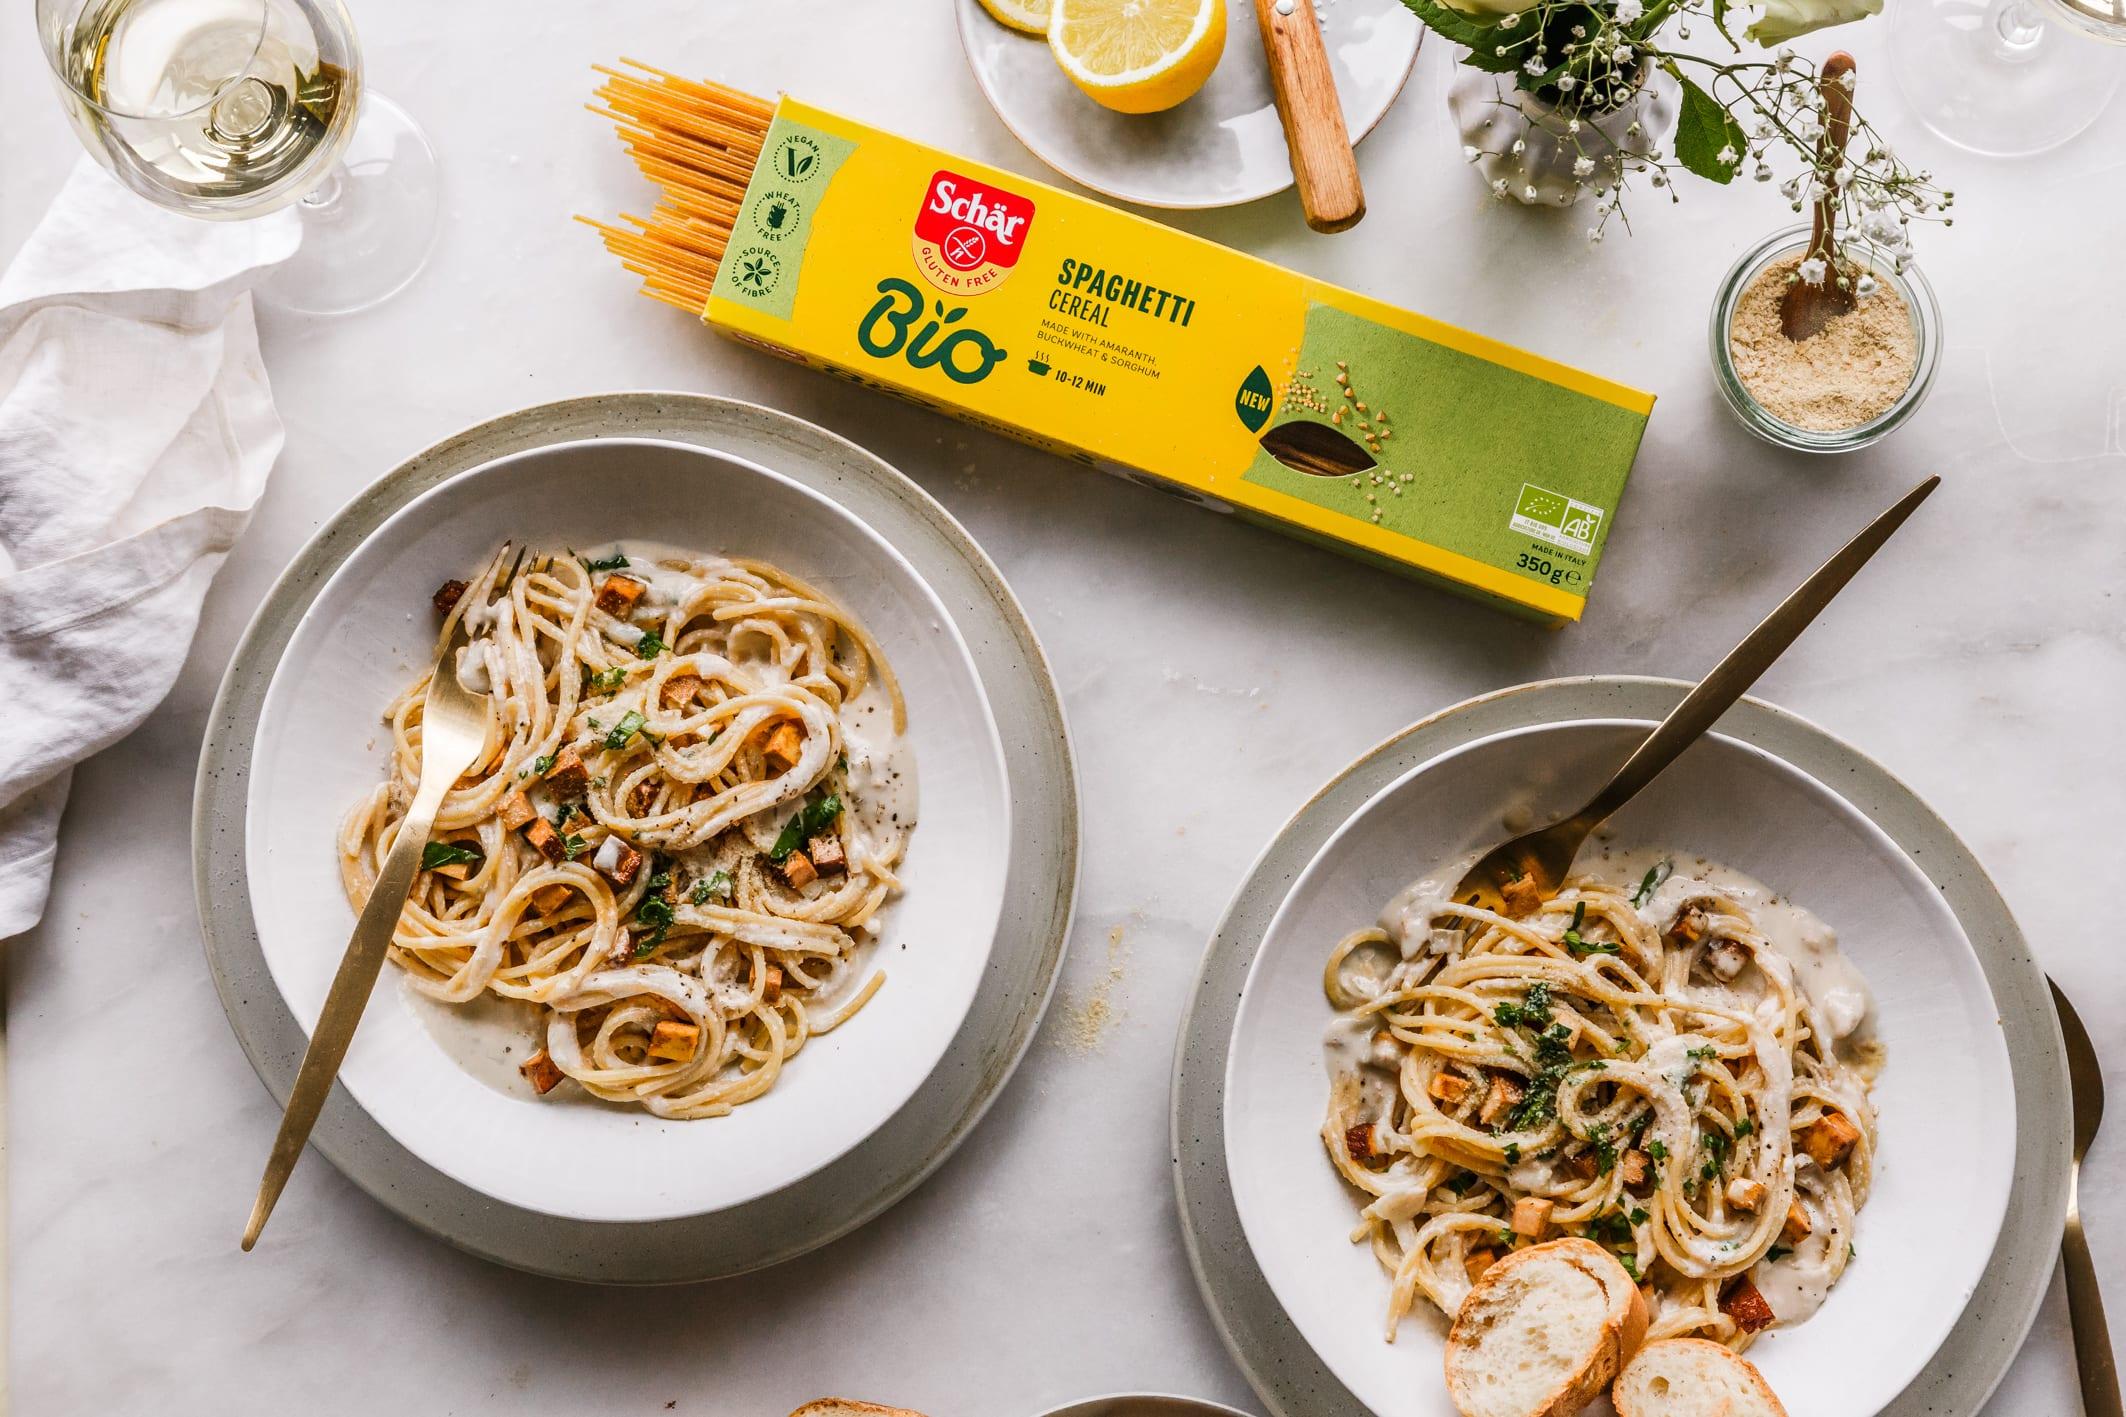 glutenfreie spaghetti carbonara